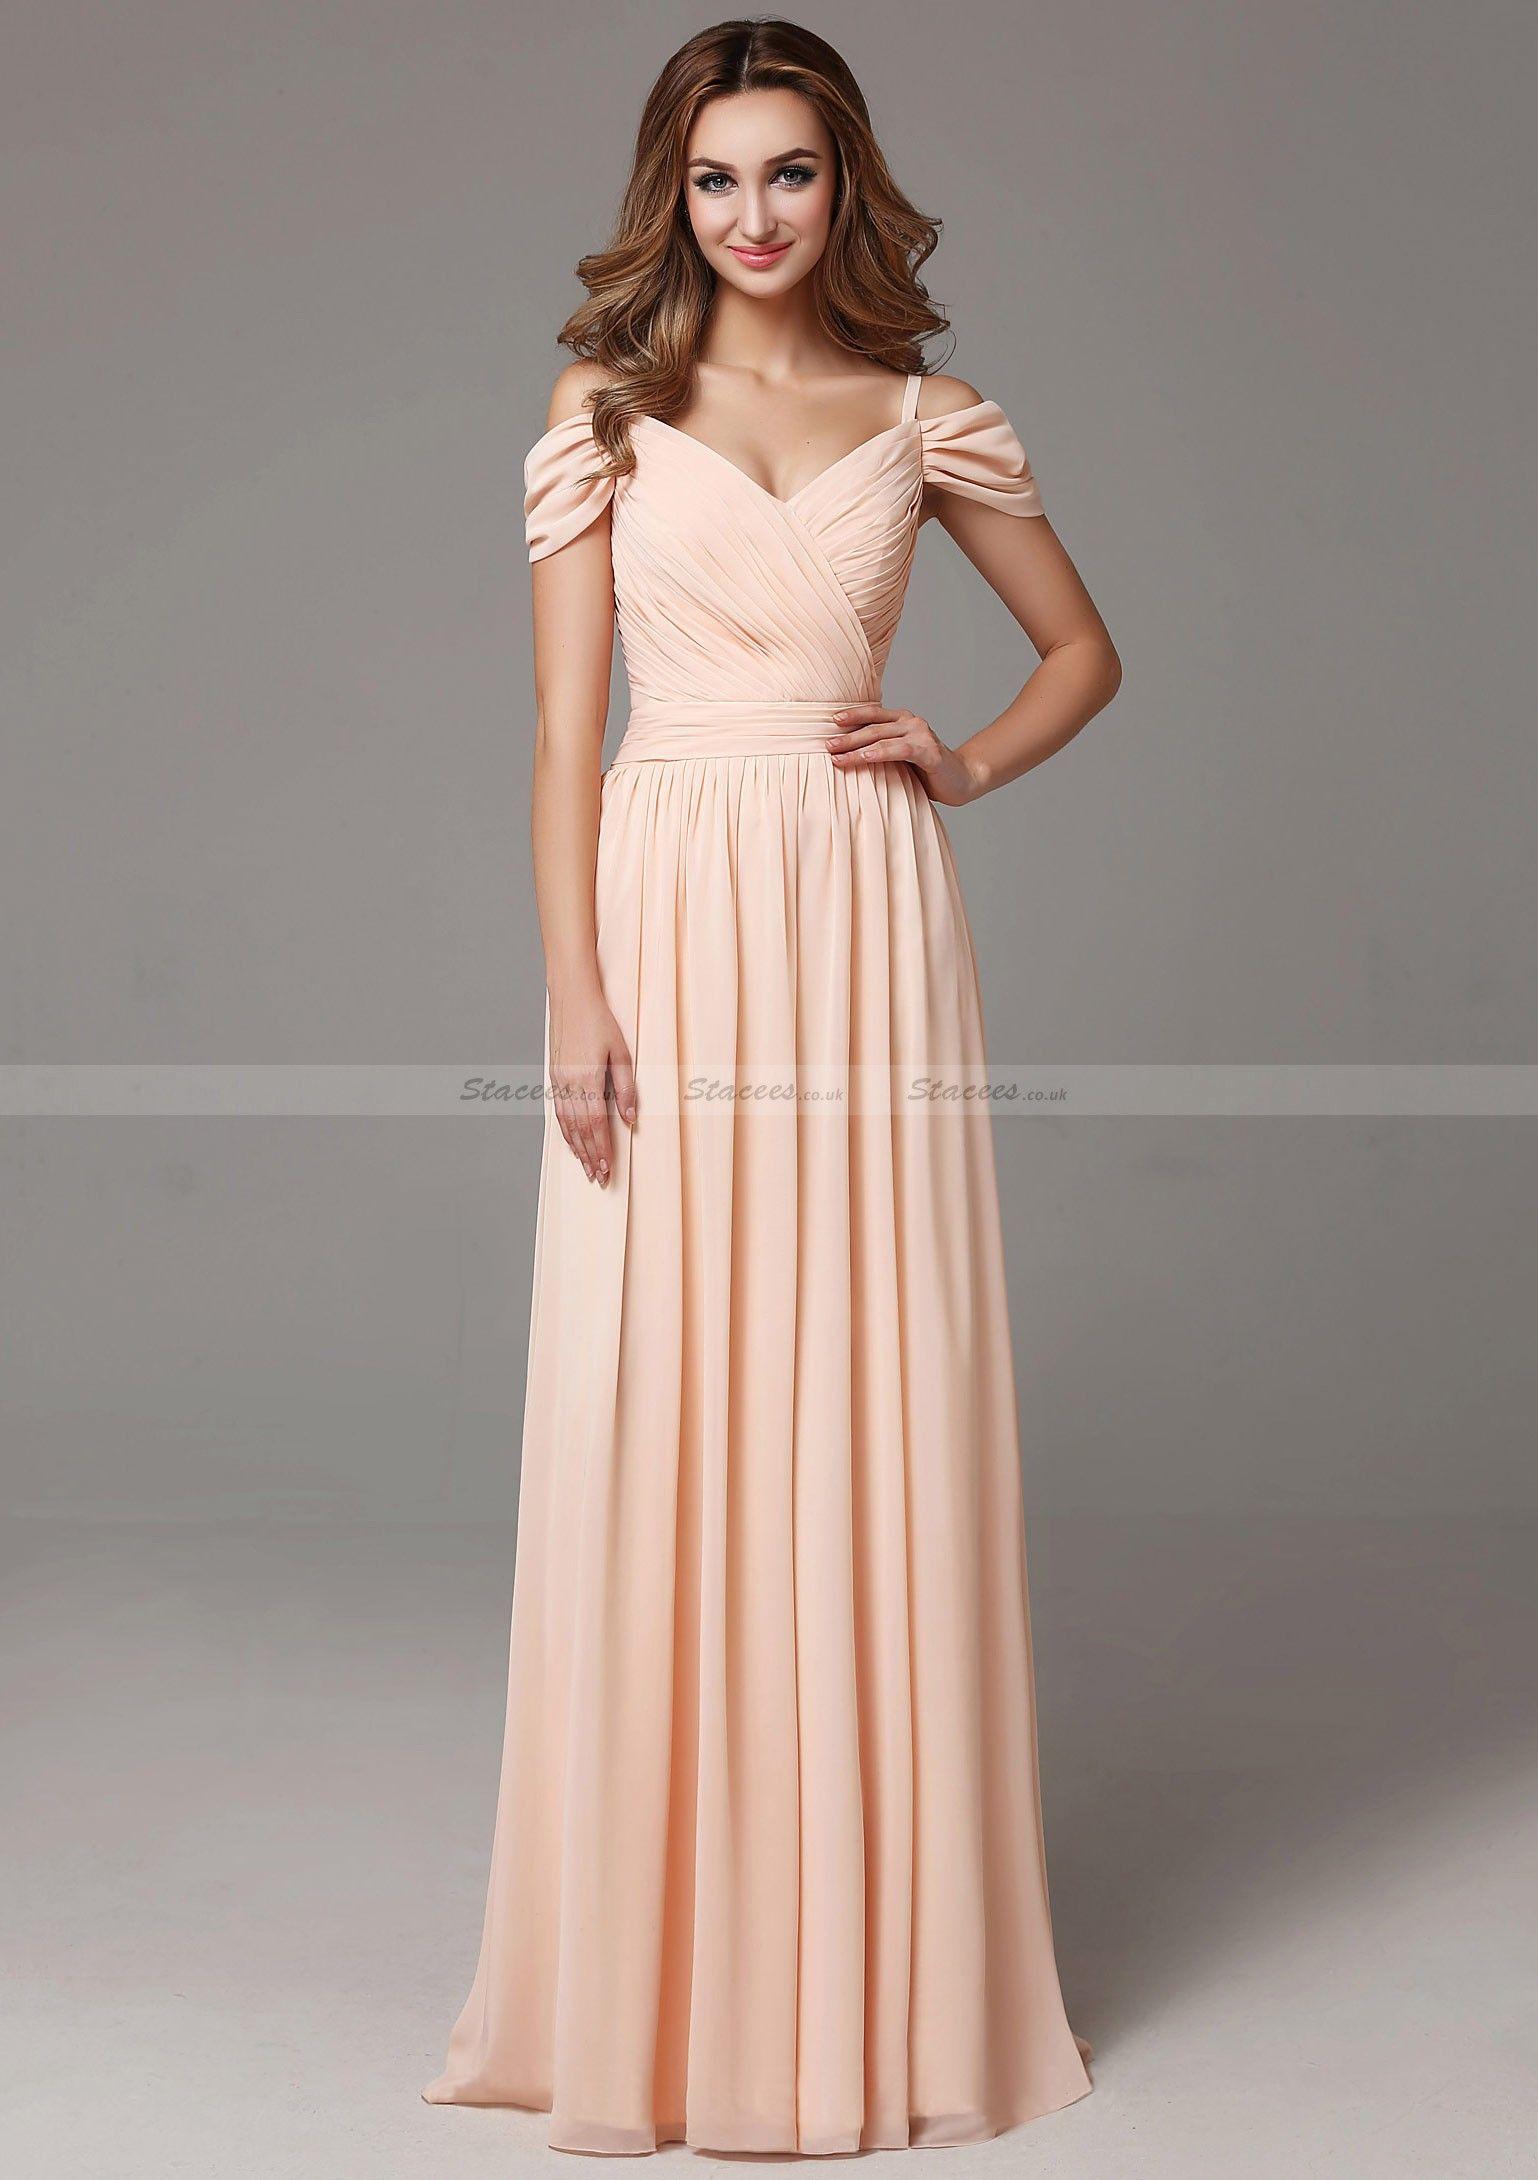 Chiffon Bridesmaid Dress ALine/Princess VNeck Long/Floor